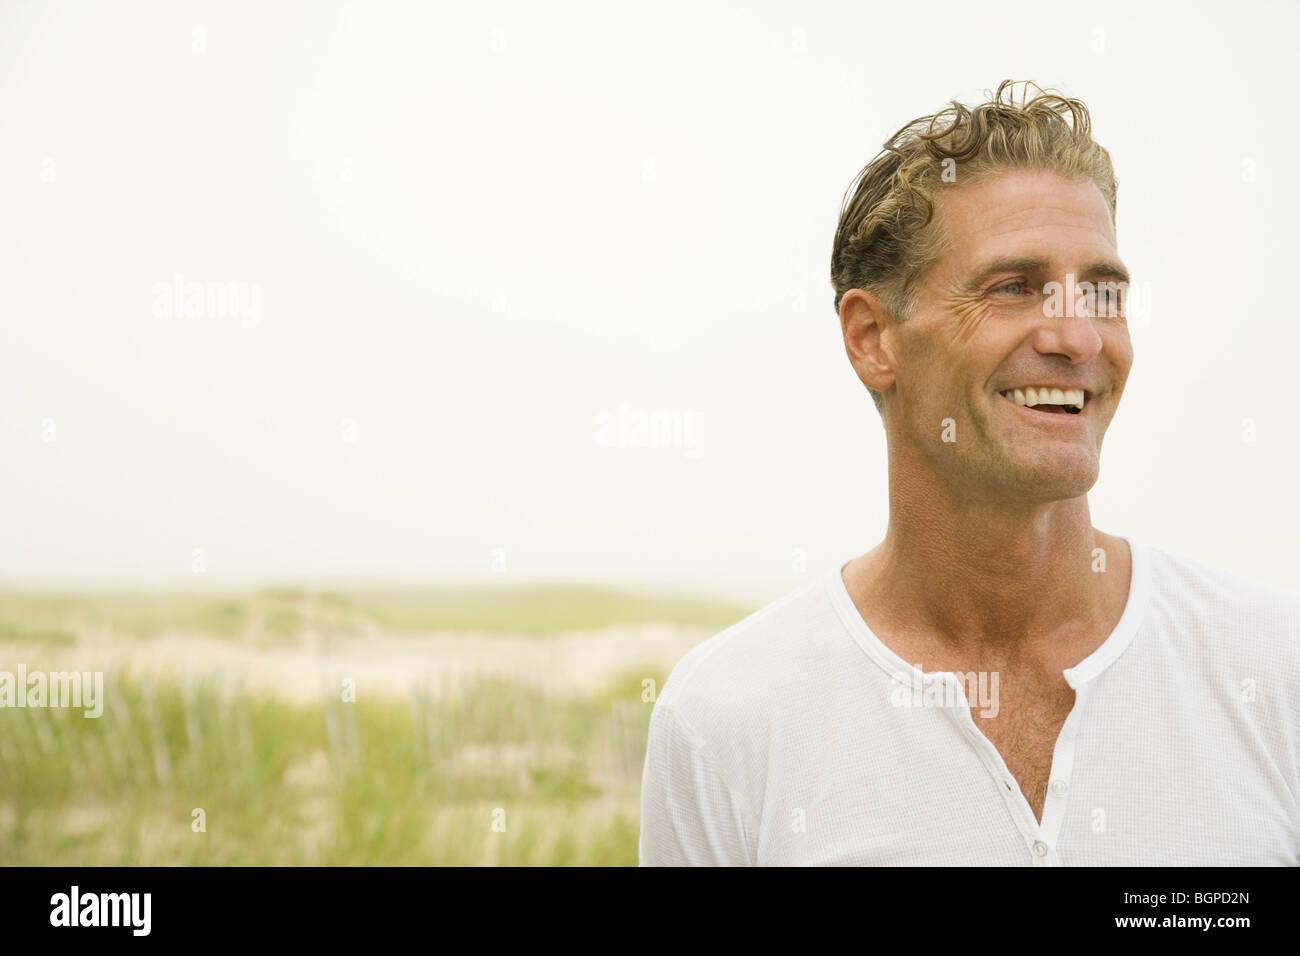 Close-up of a mature man smiling - Stock Image